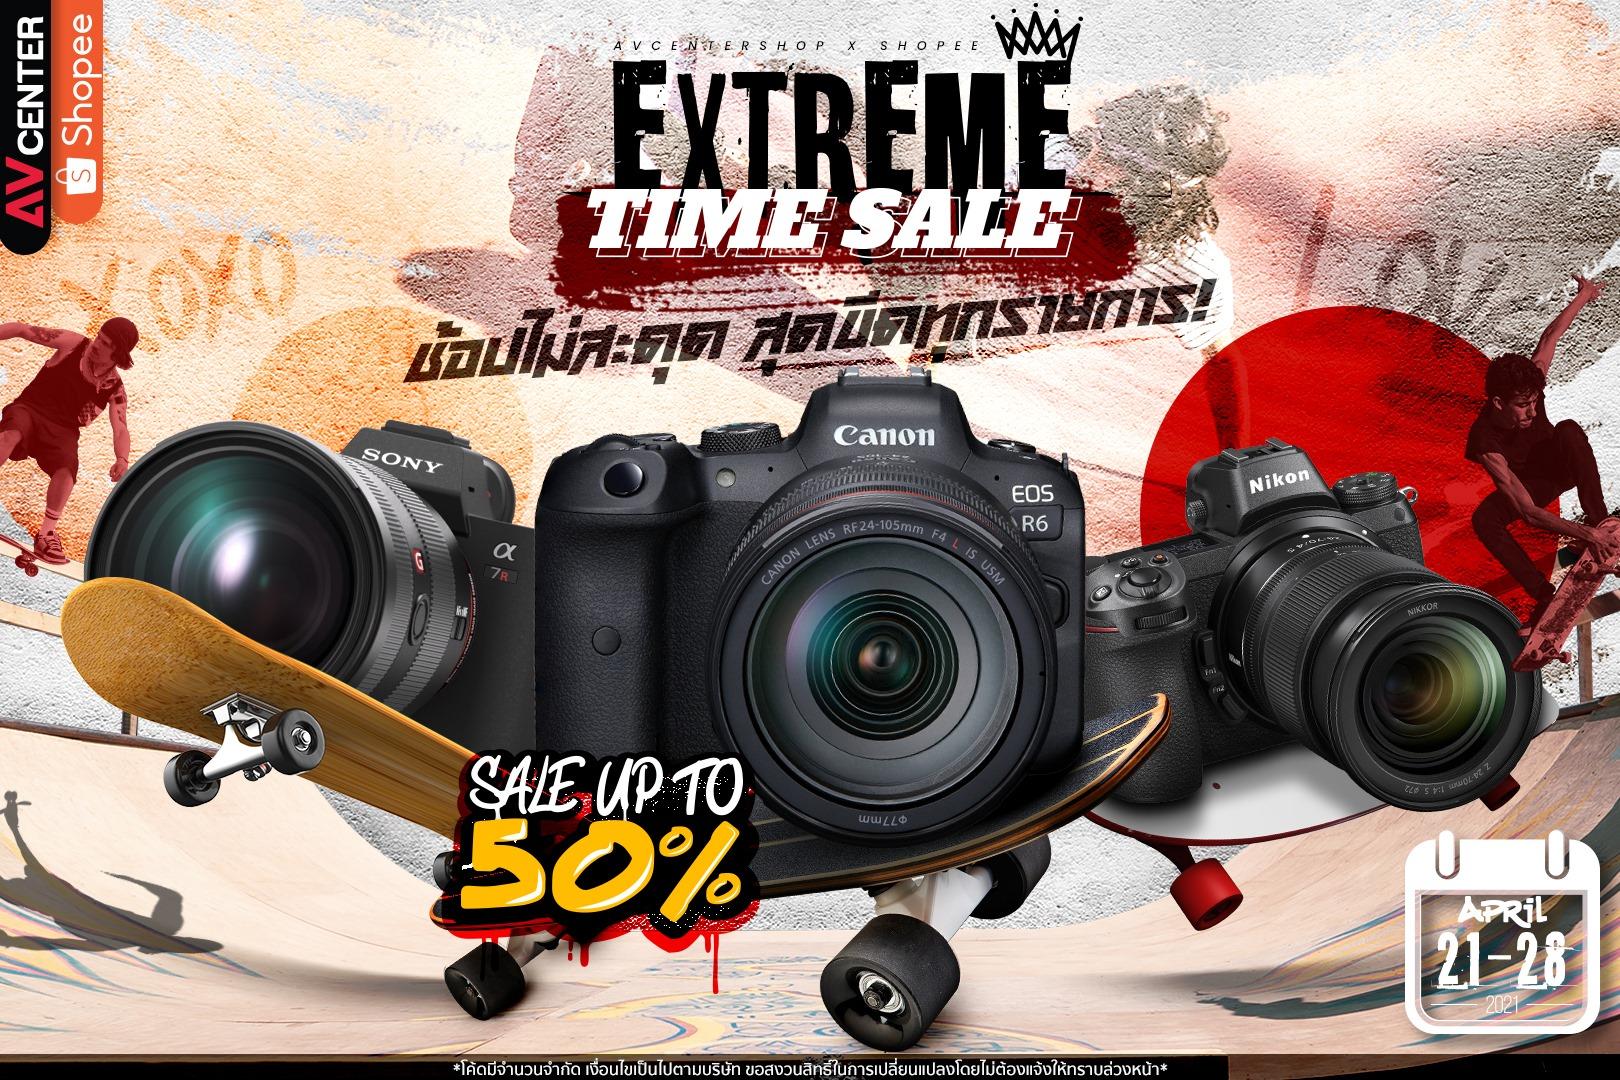 Extreme Time Sale! ช่วงเวลาลดสุด ช้อปไม่สะดุด สุดขีดทุกรายการ